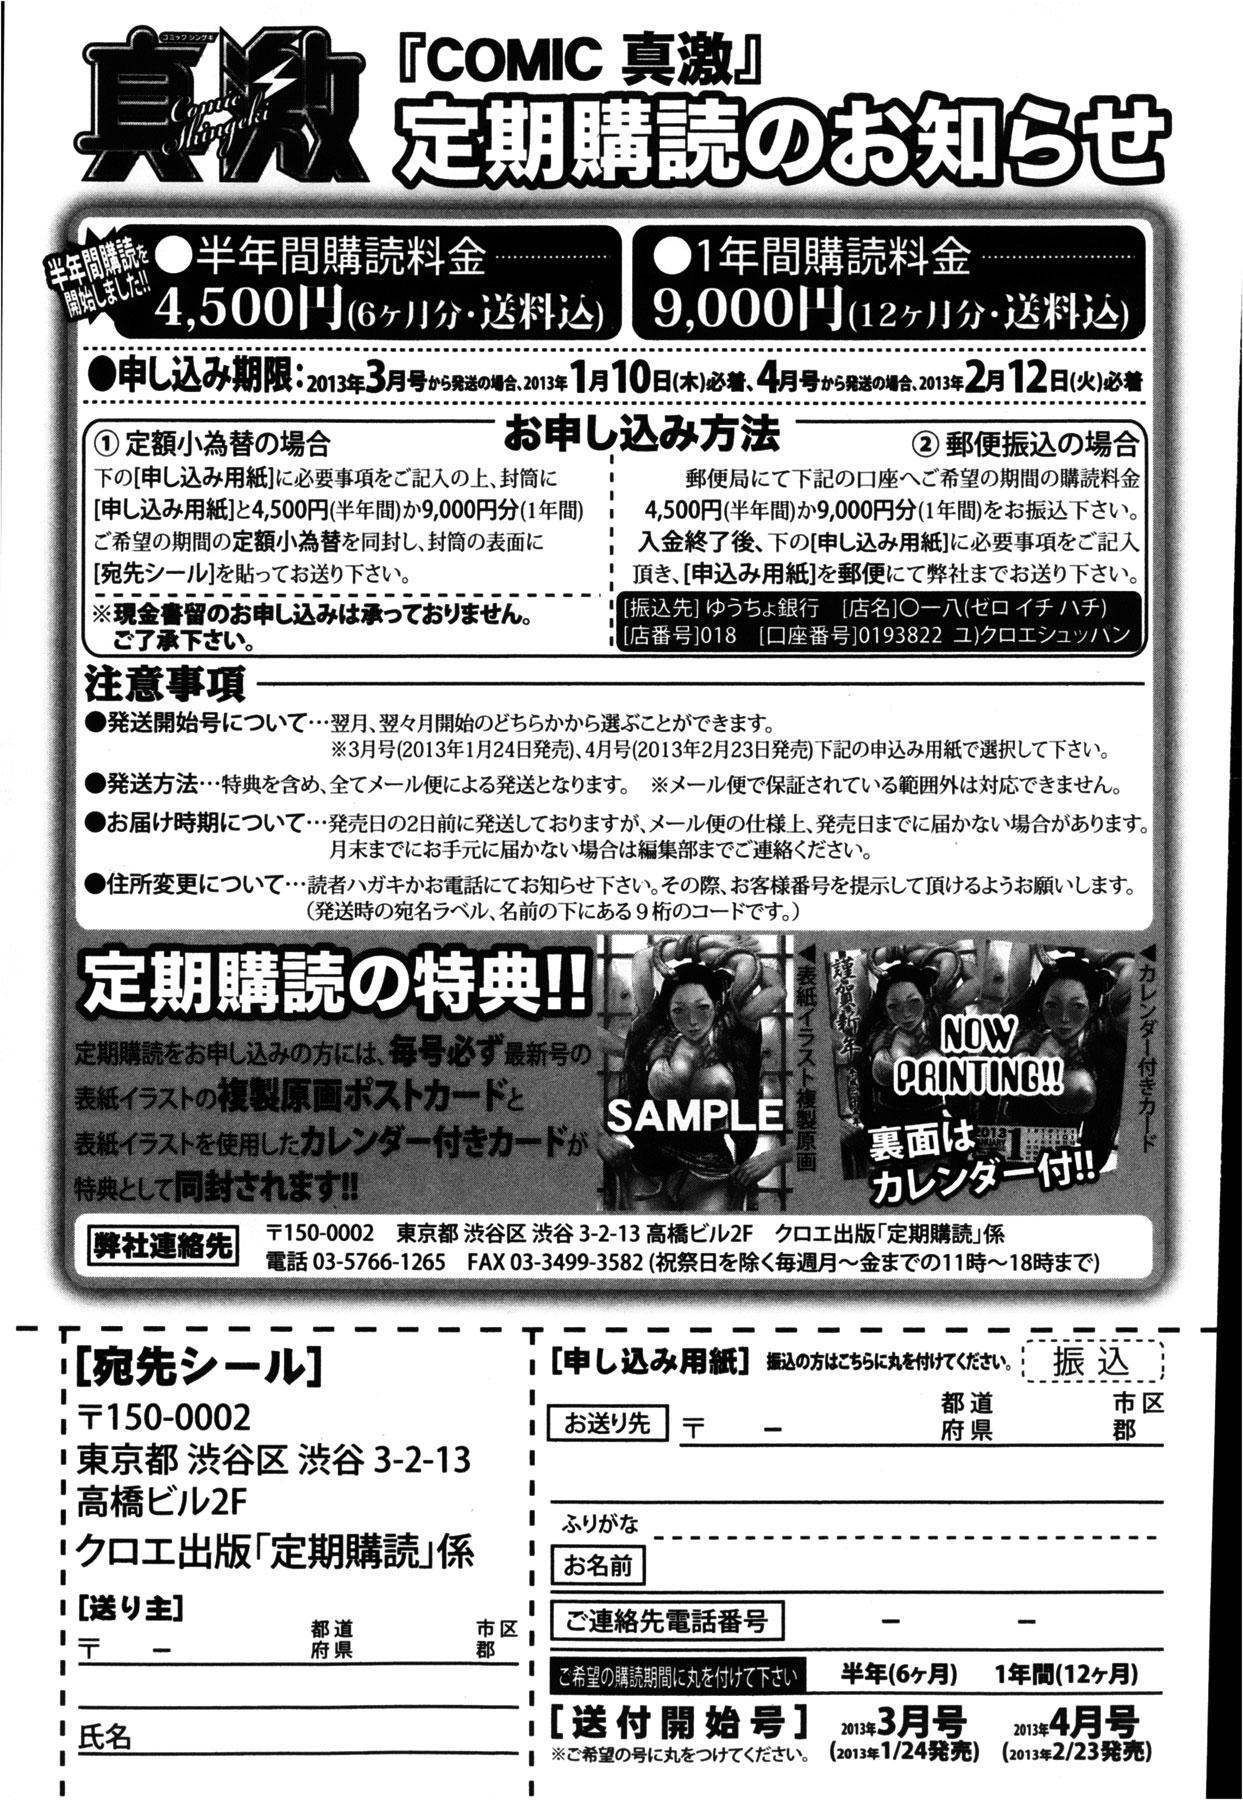 COMIC Shingeki 2013-02 366